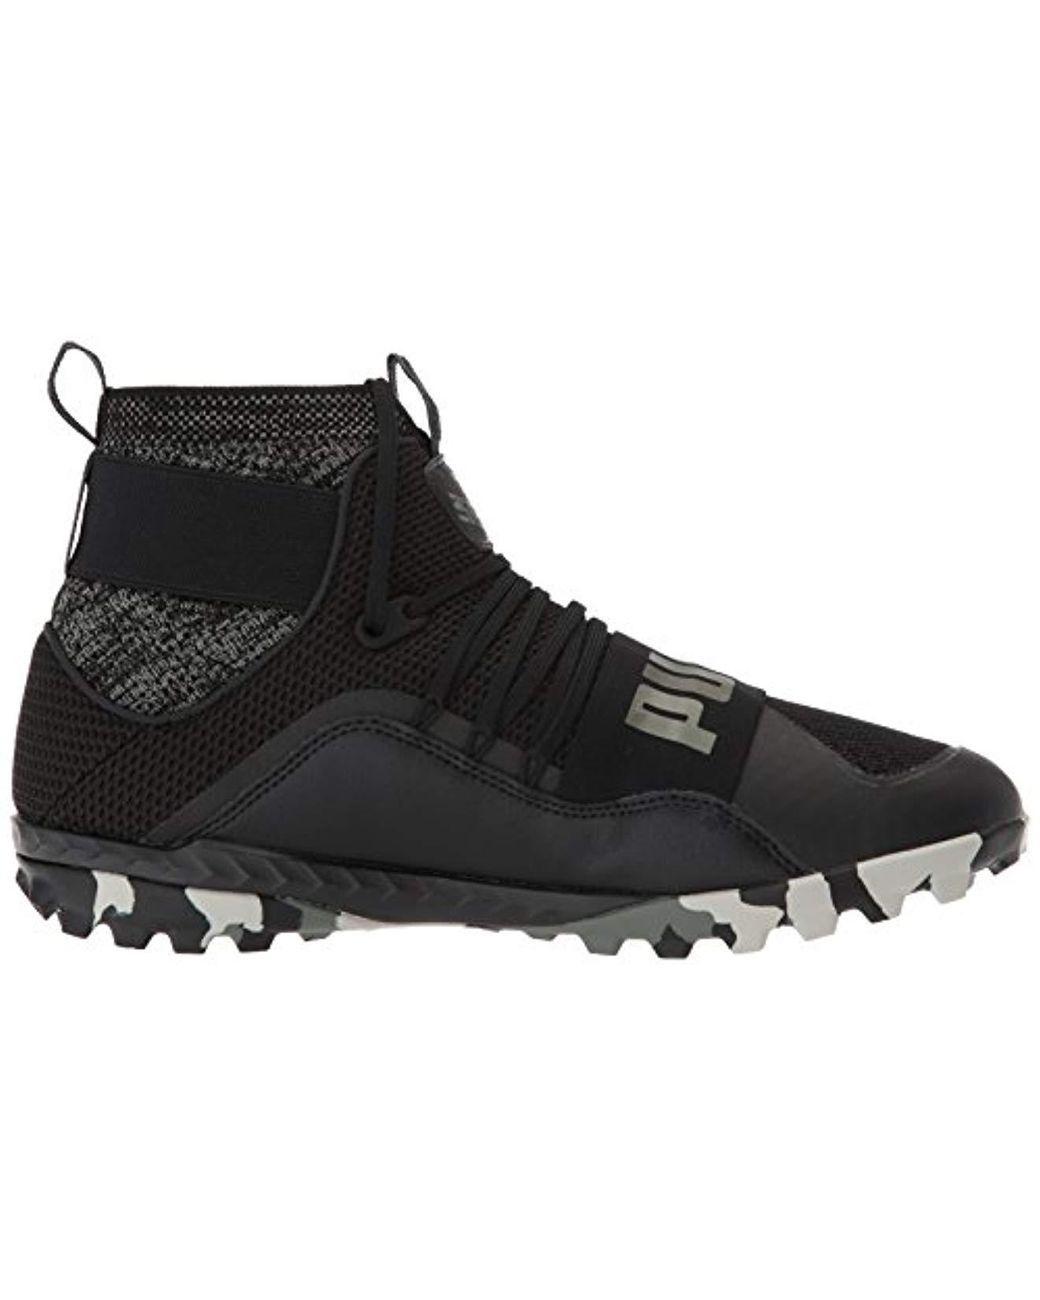 505252b5f PUMA 365.18 Ignite High St Soccer Shoe in Black for Men - Save 14% - Lyst